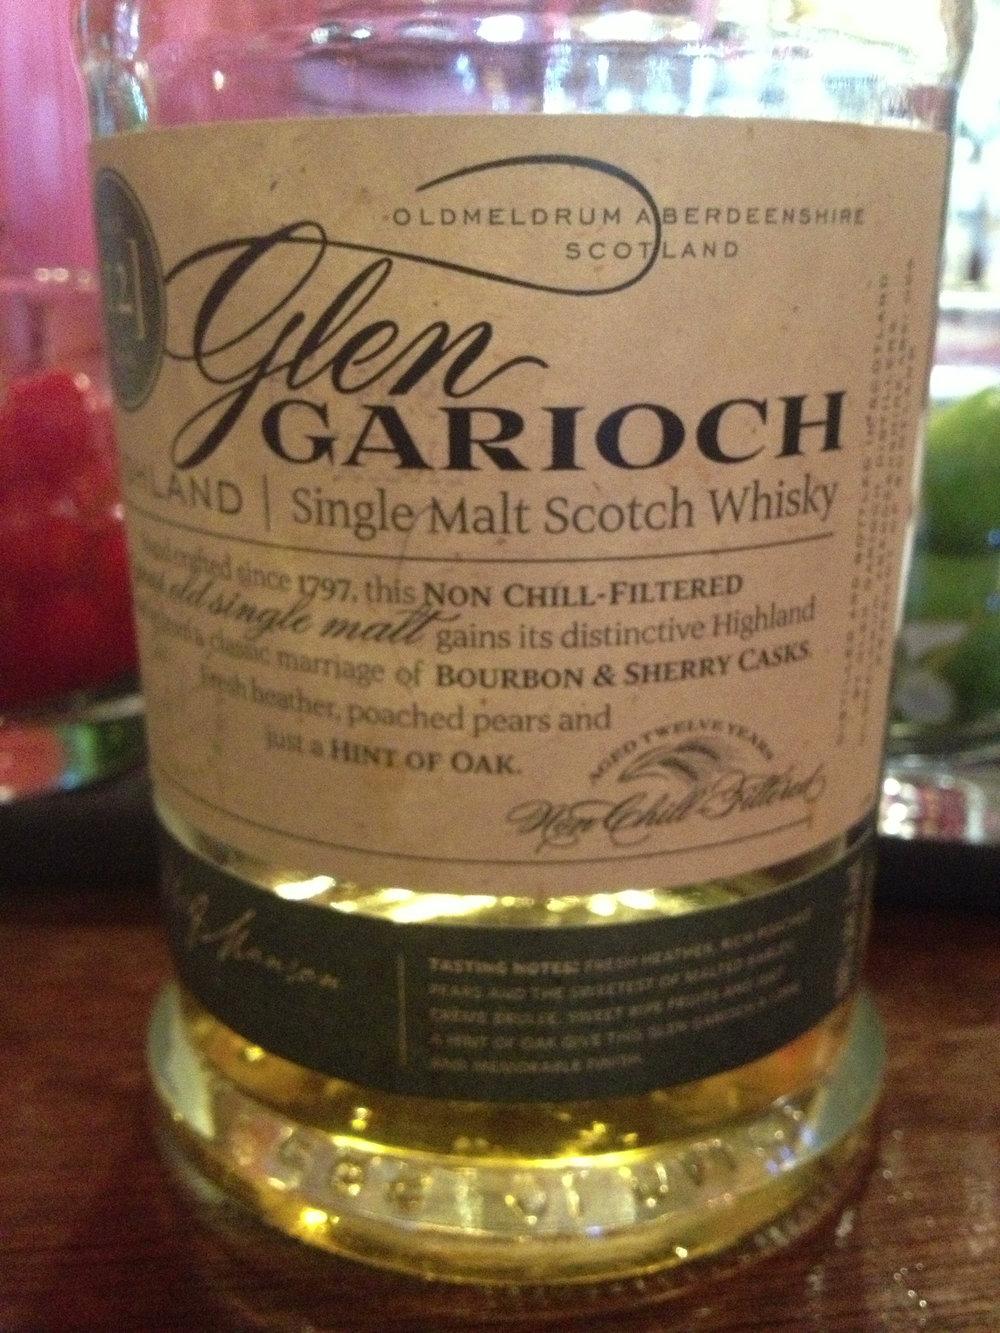 12 Year Old | 48% ABV - Distillery | Glen Garioch